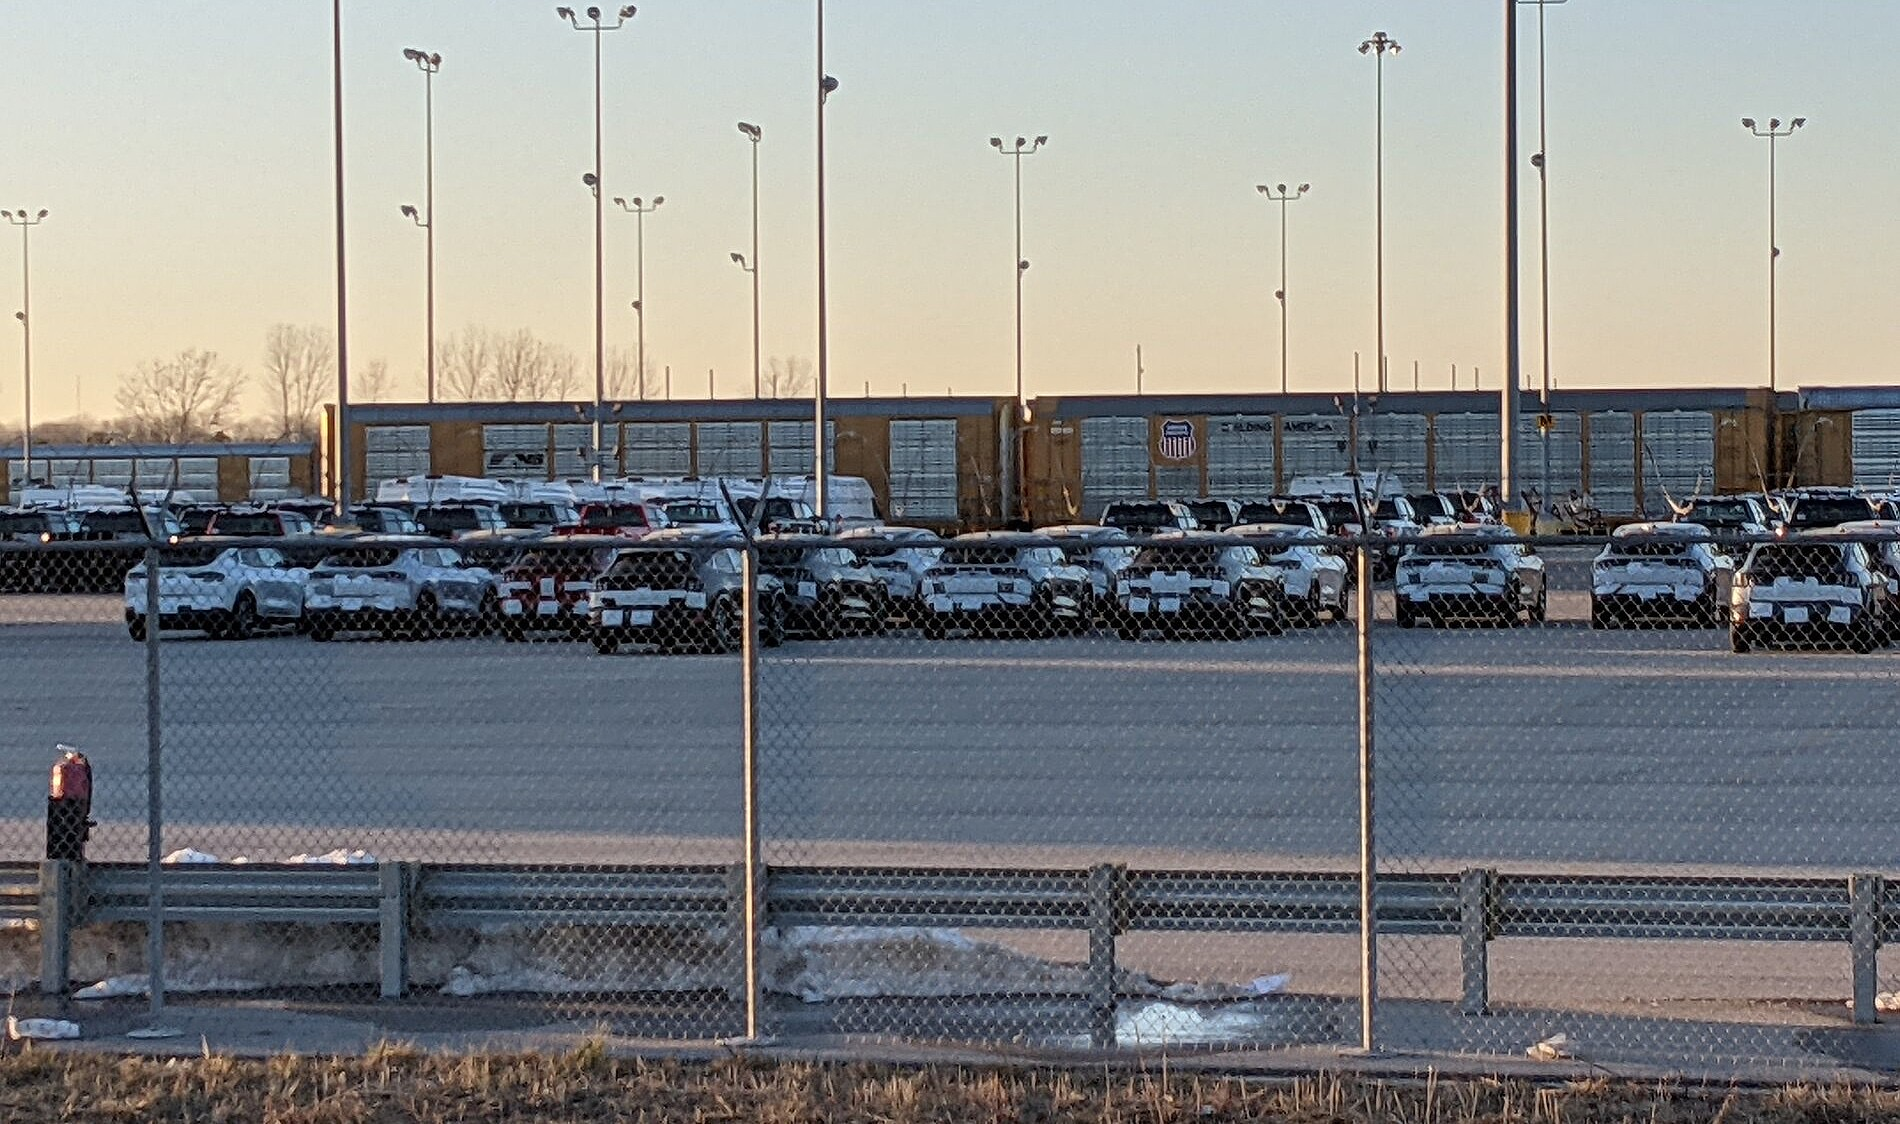 Отгрузка Ford Mustang Mach-E была замечена в Канзас-Сити на пути к дилерам